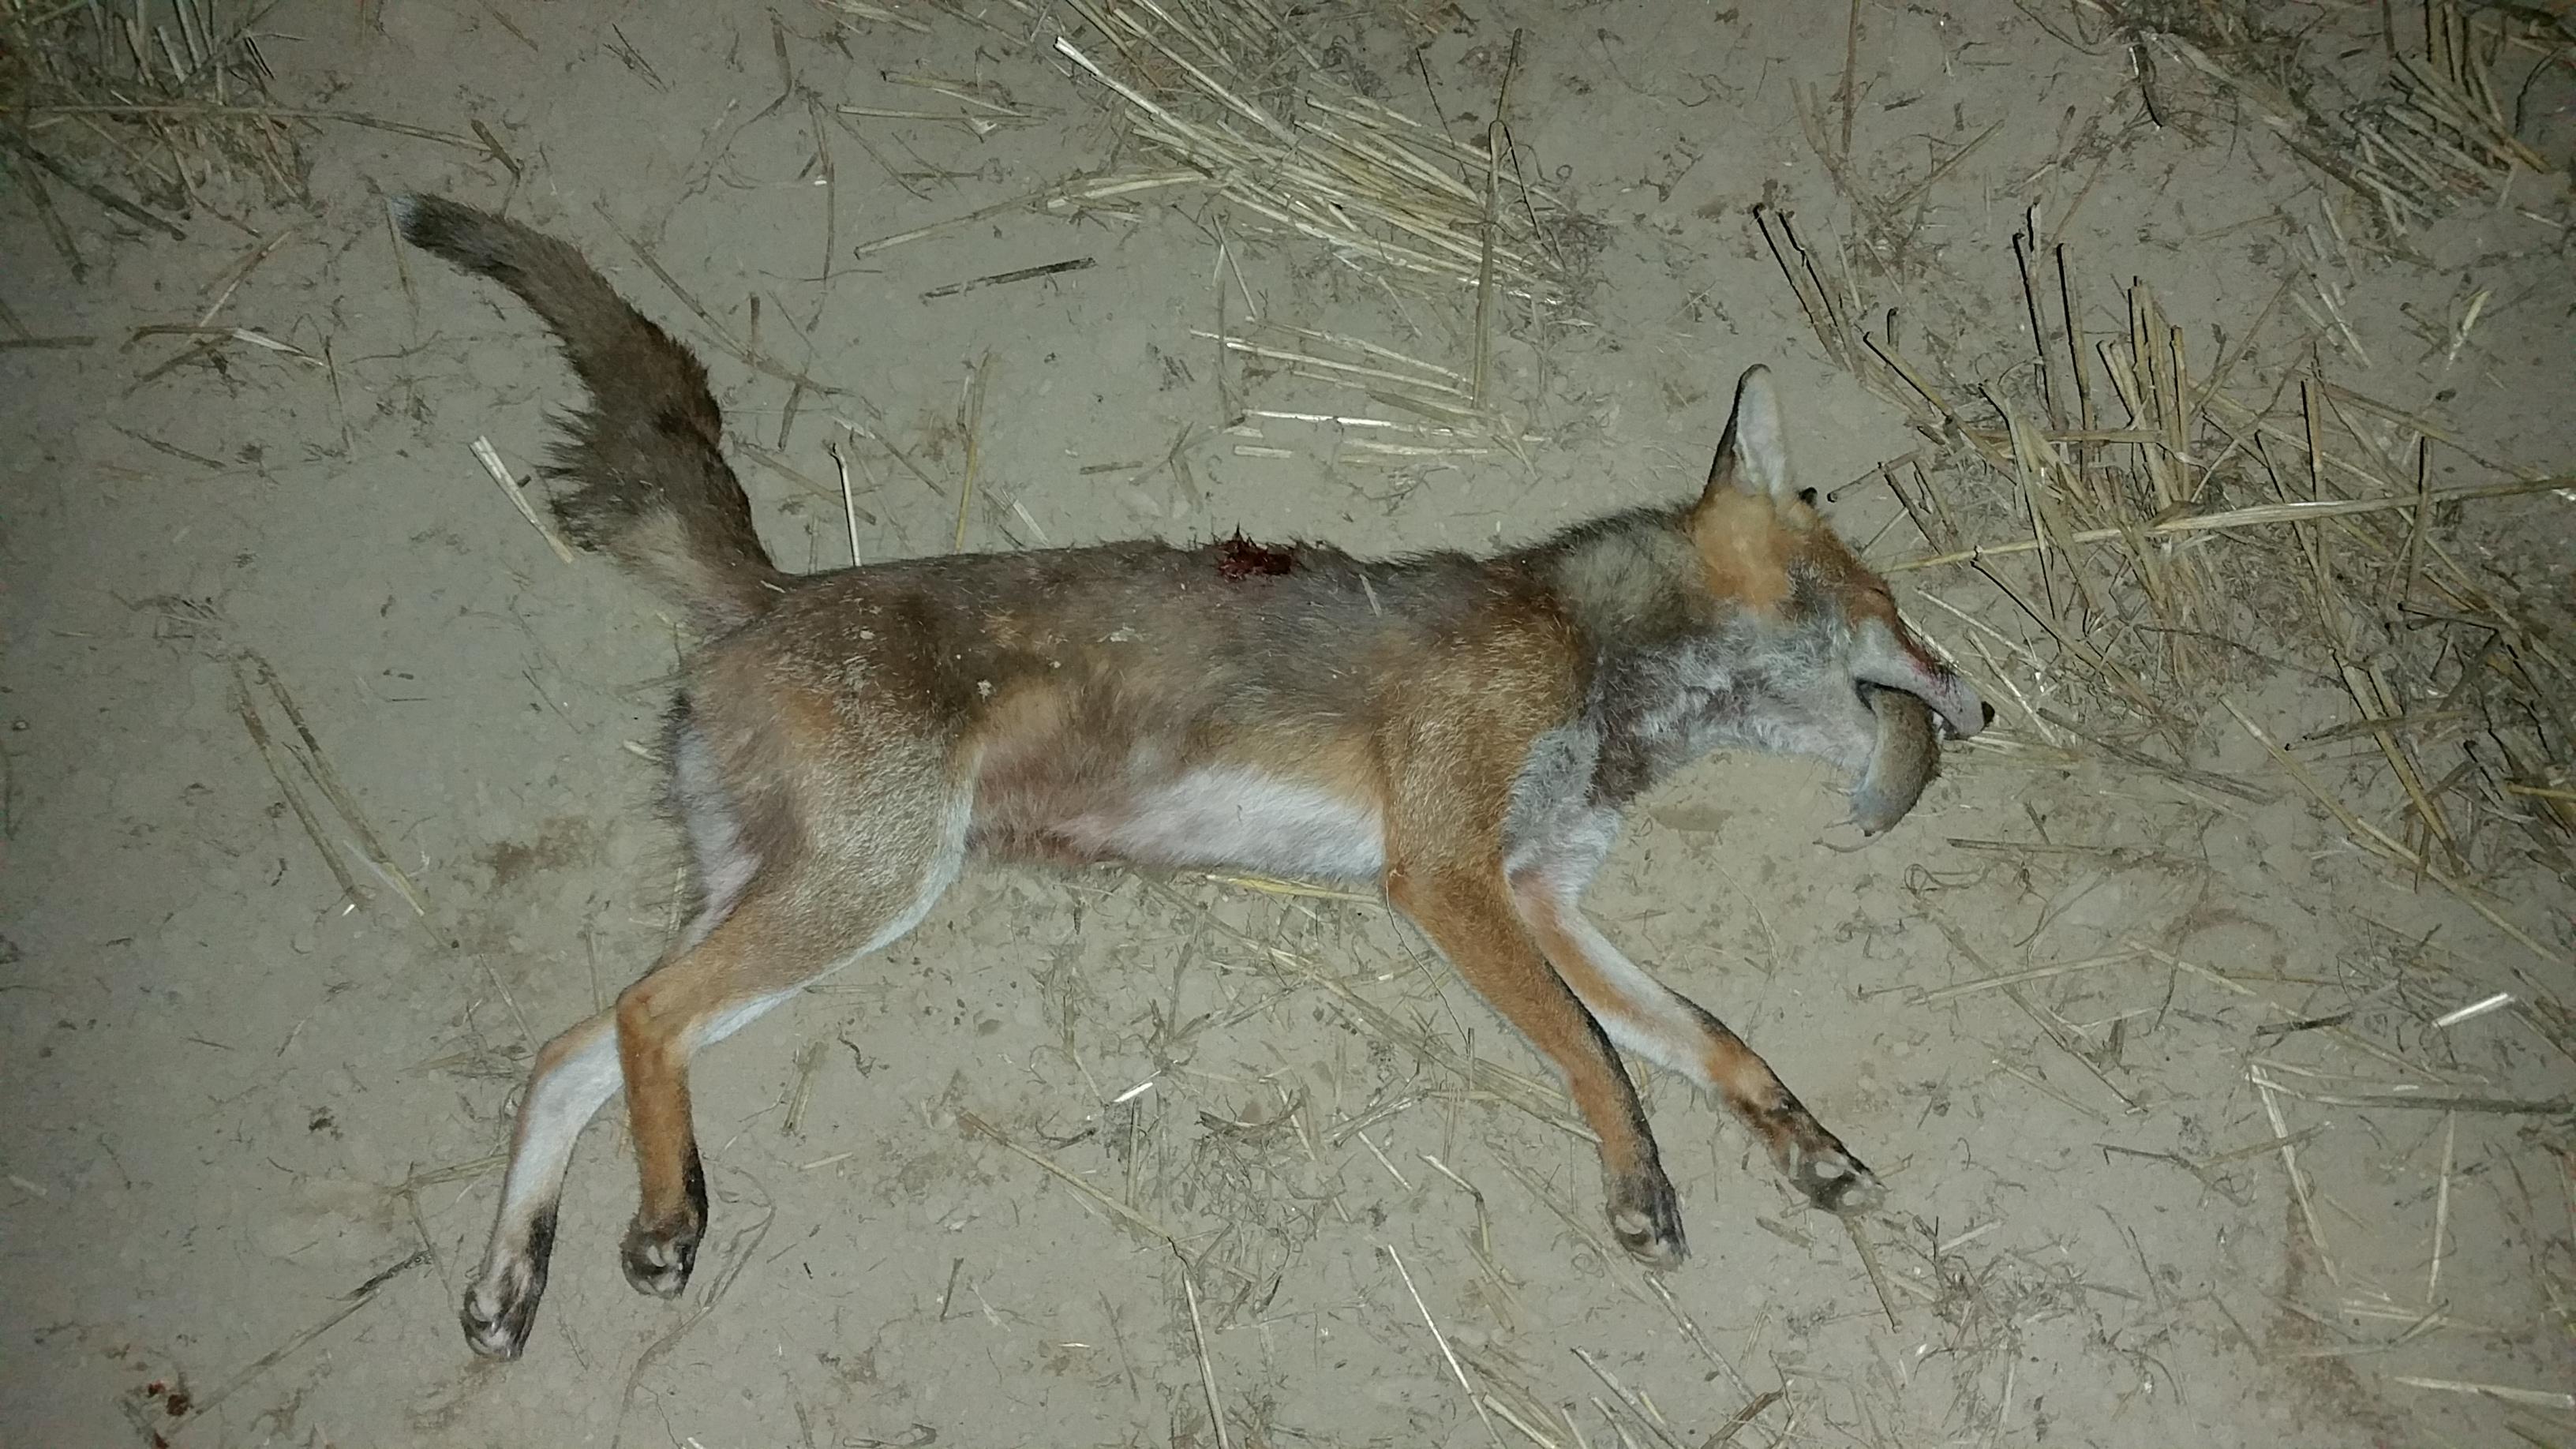 Fuchs mit Maus im Fang